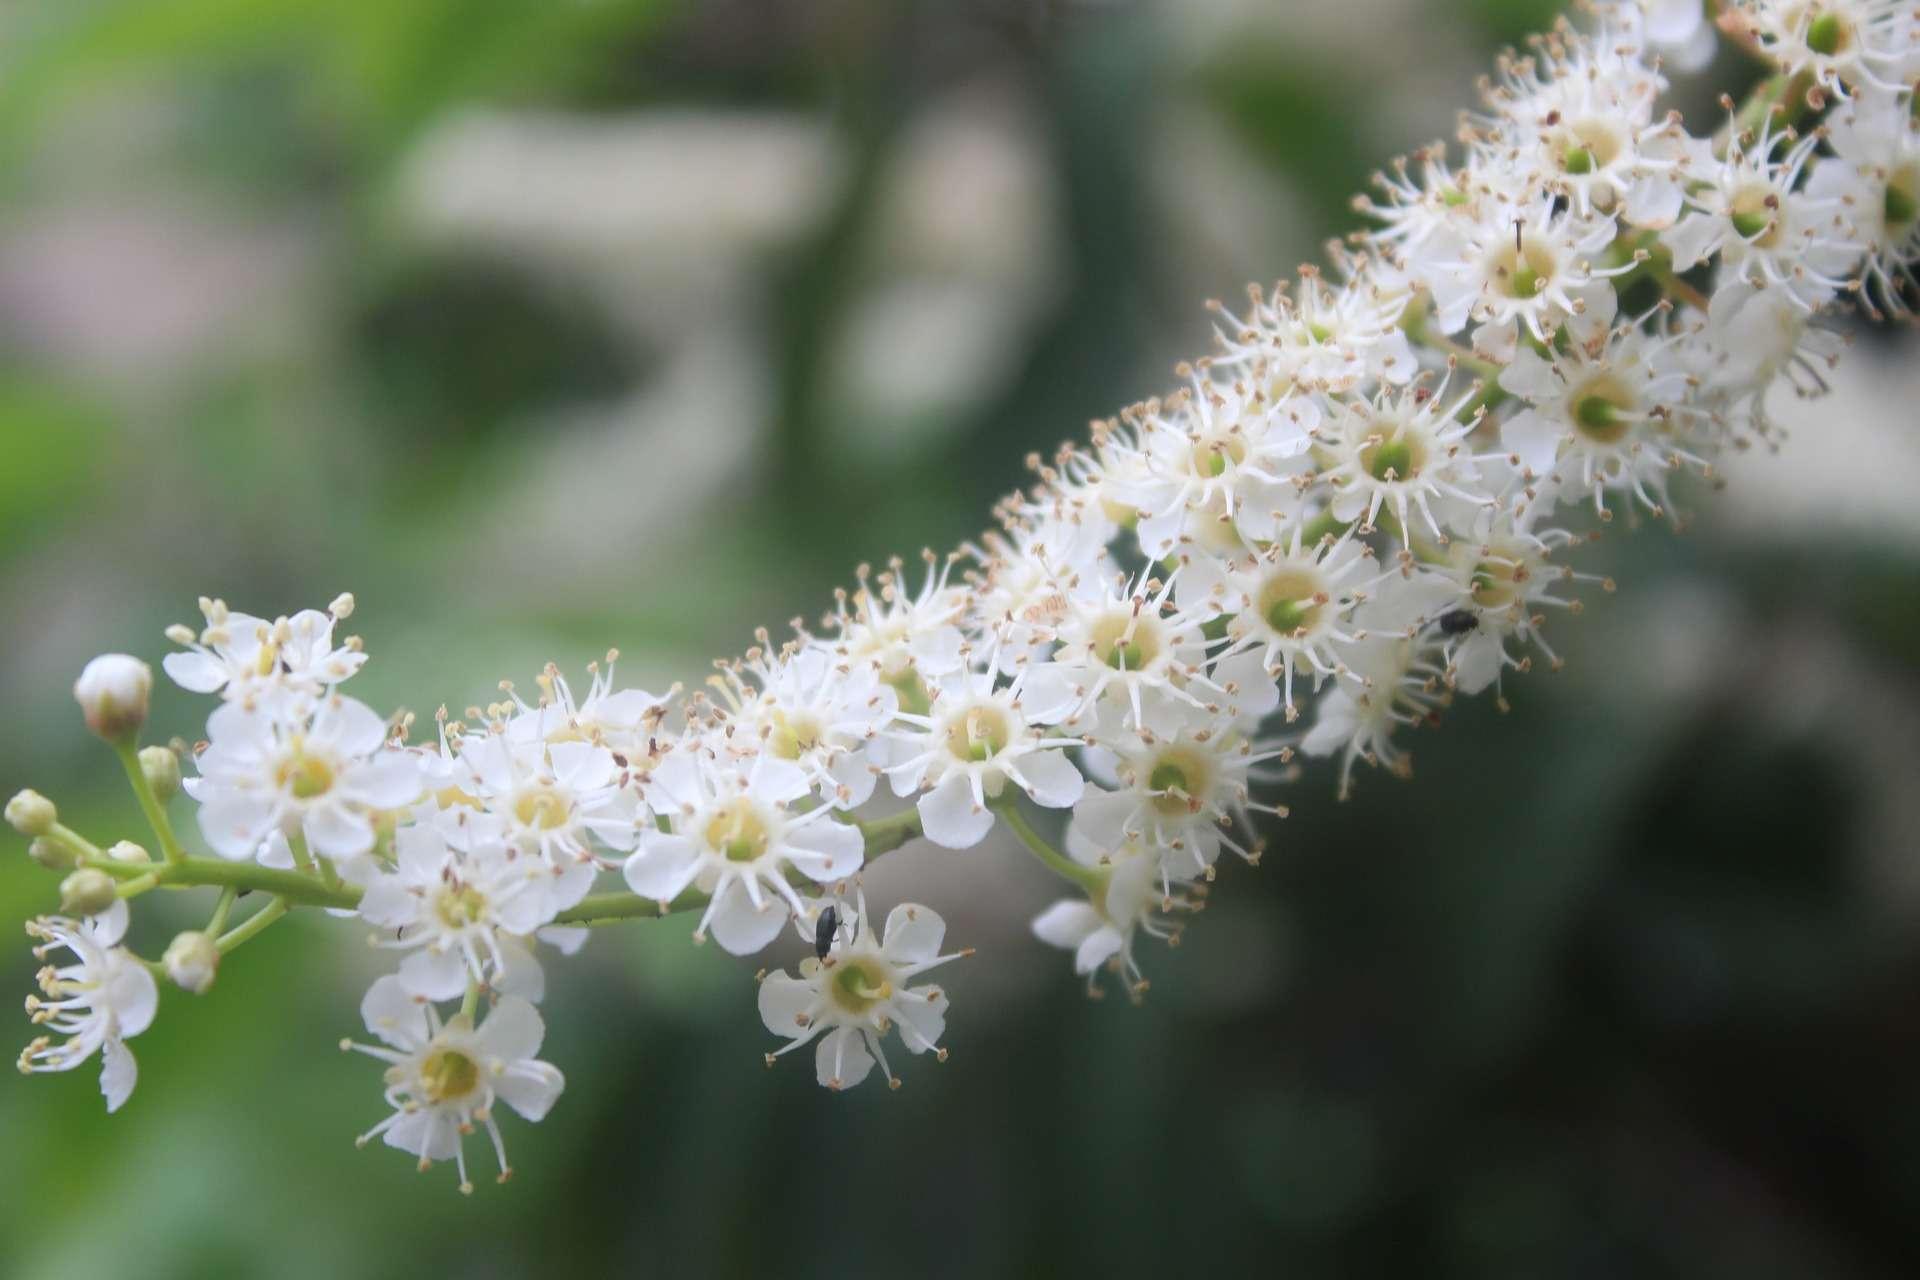 laurel-blossom-3462967_1920-1920